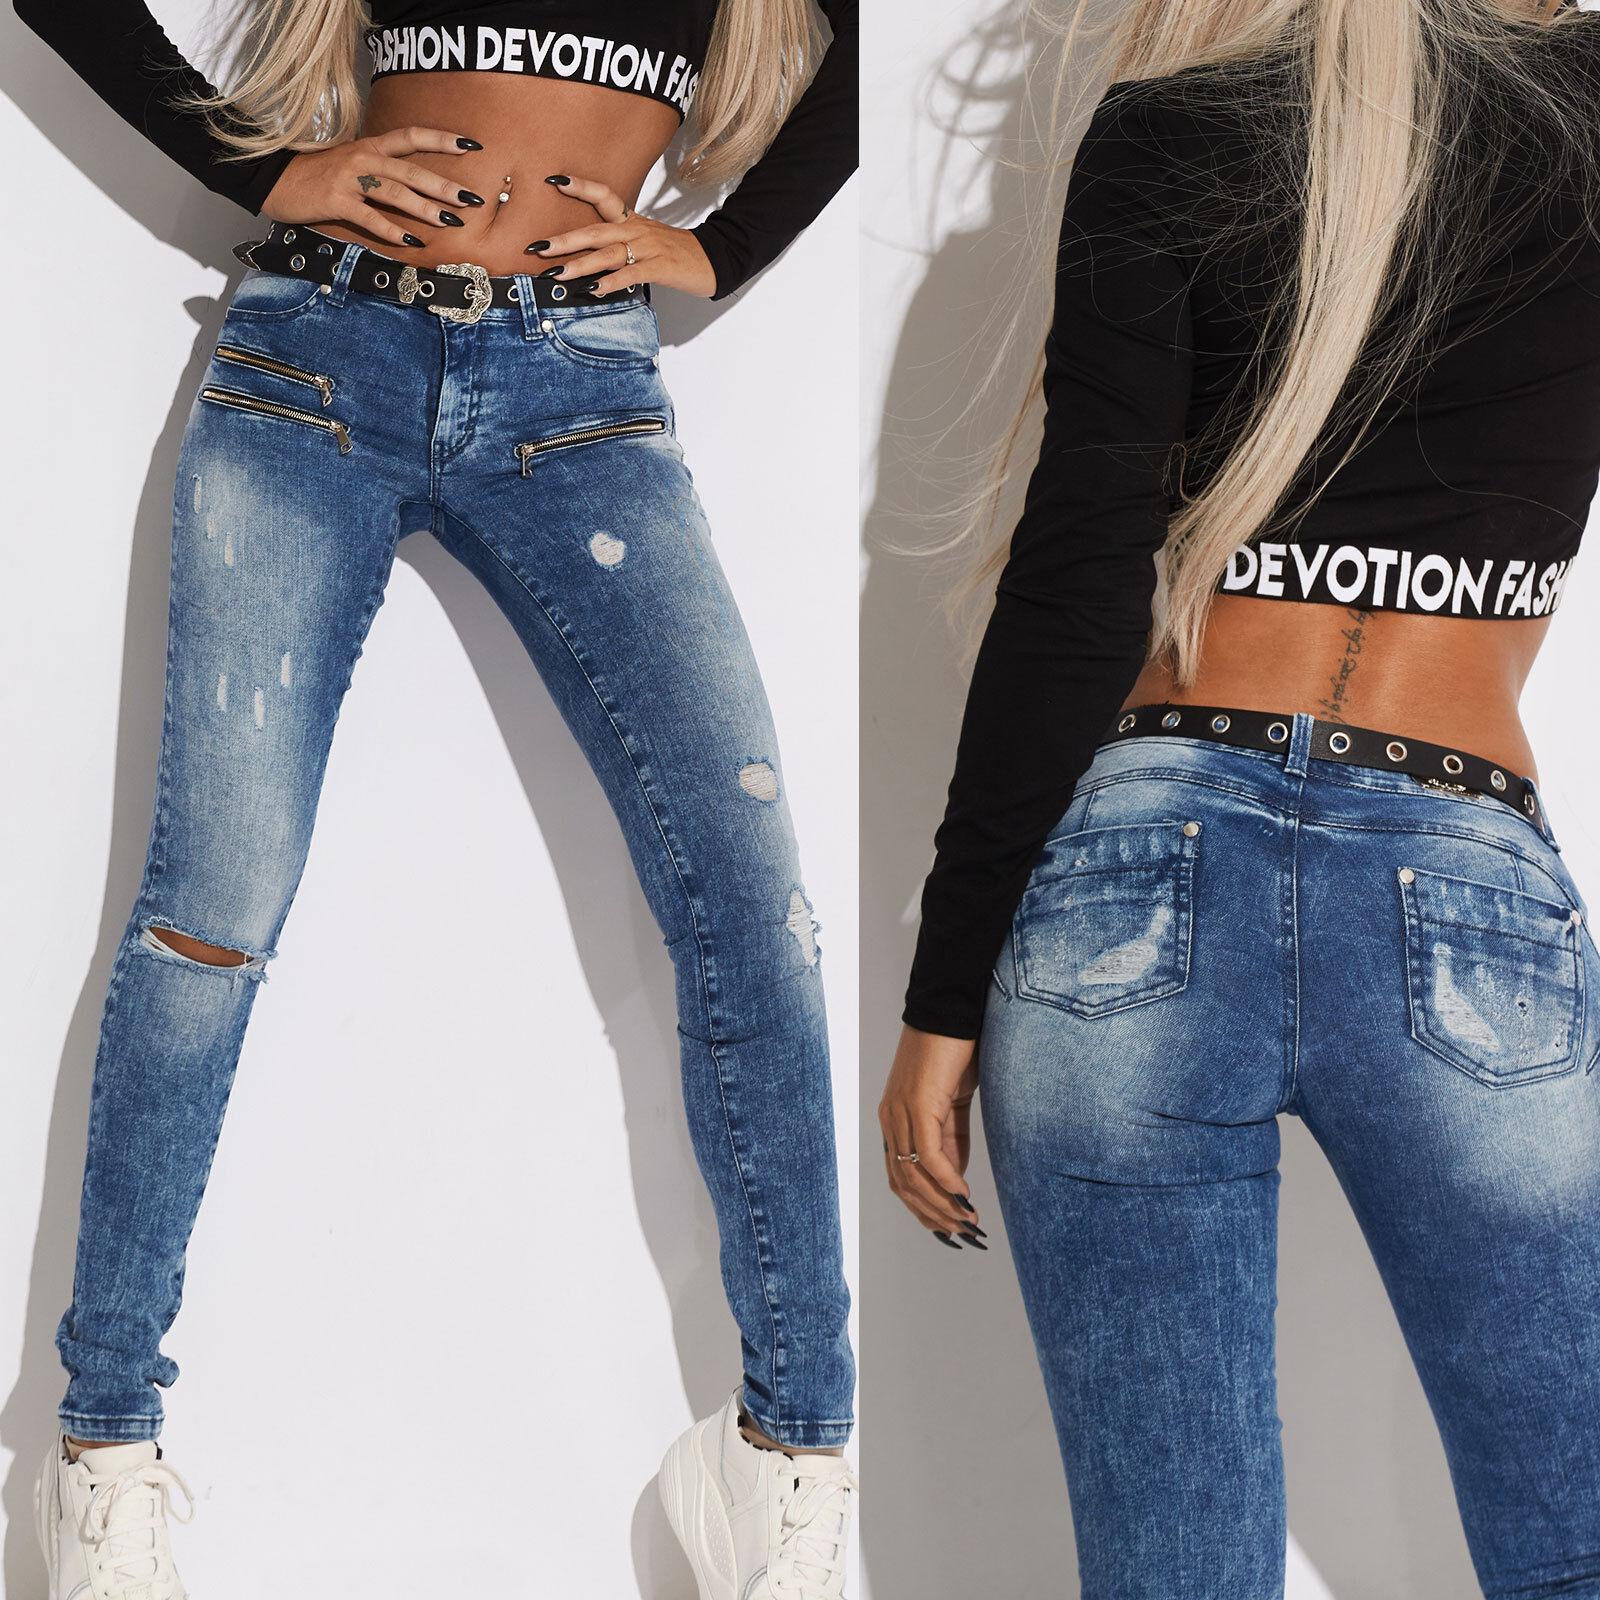 By Alina Damenhose Stretchjeans Röhrenjeans Hüftjeans Skinny Jeans Zipper XS S M